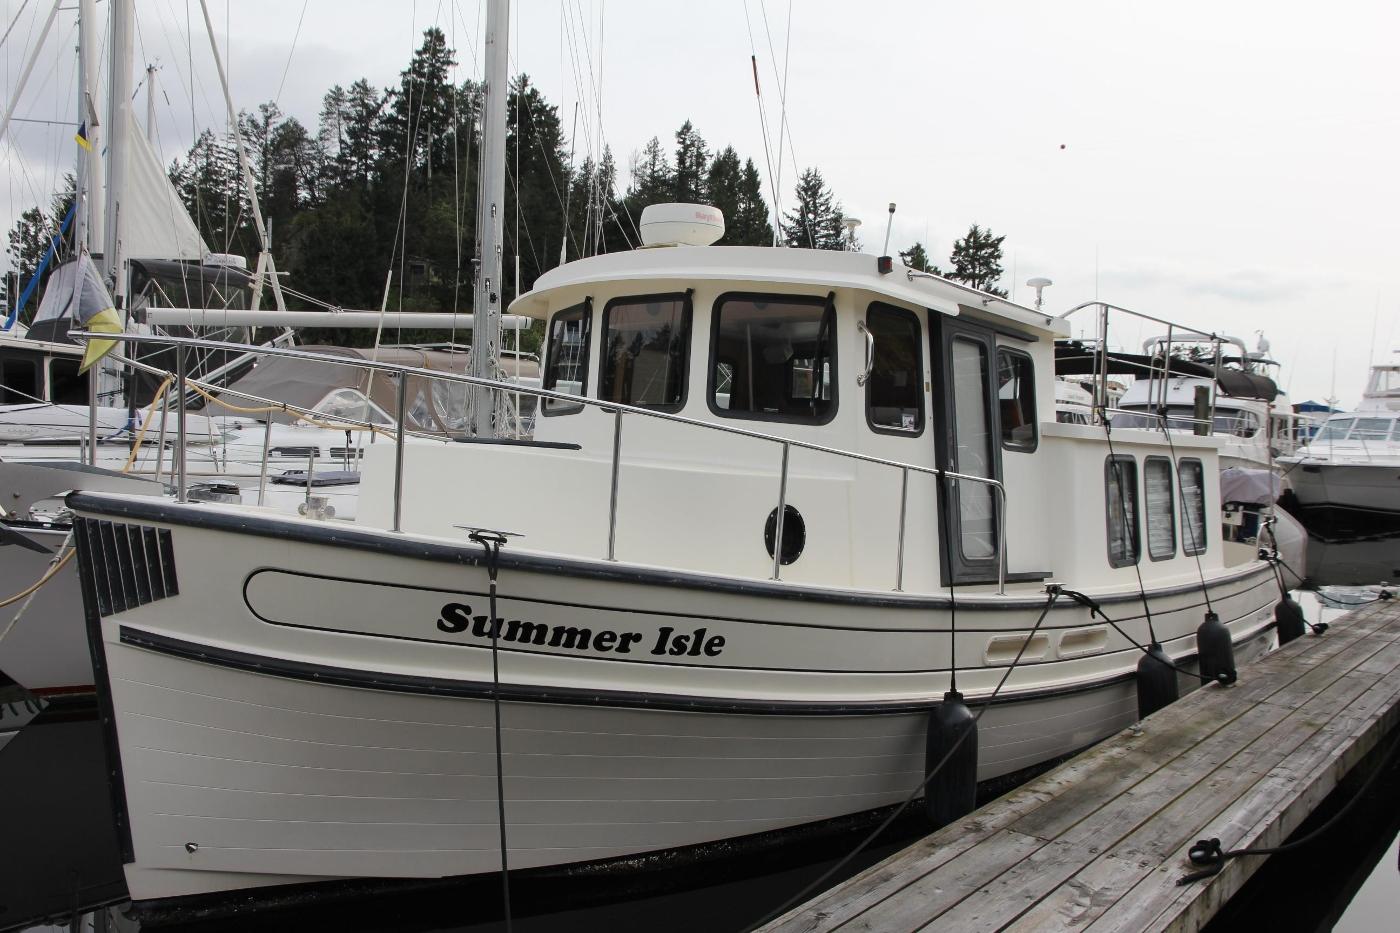 2001 Nordic Tugs 32 Pilothouse, Portside Profile